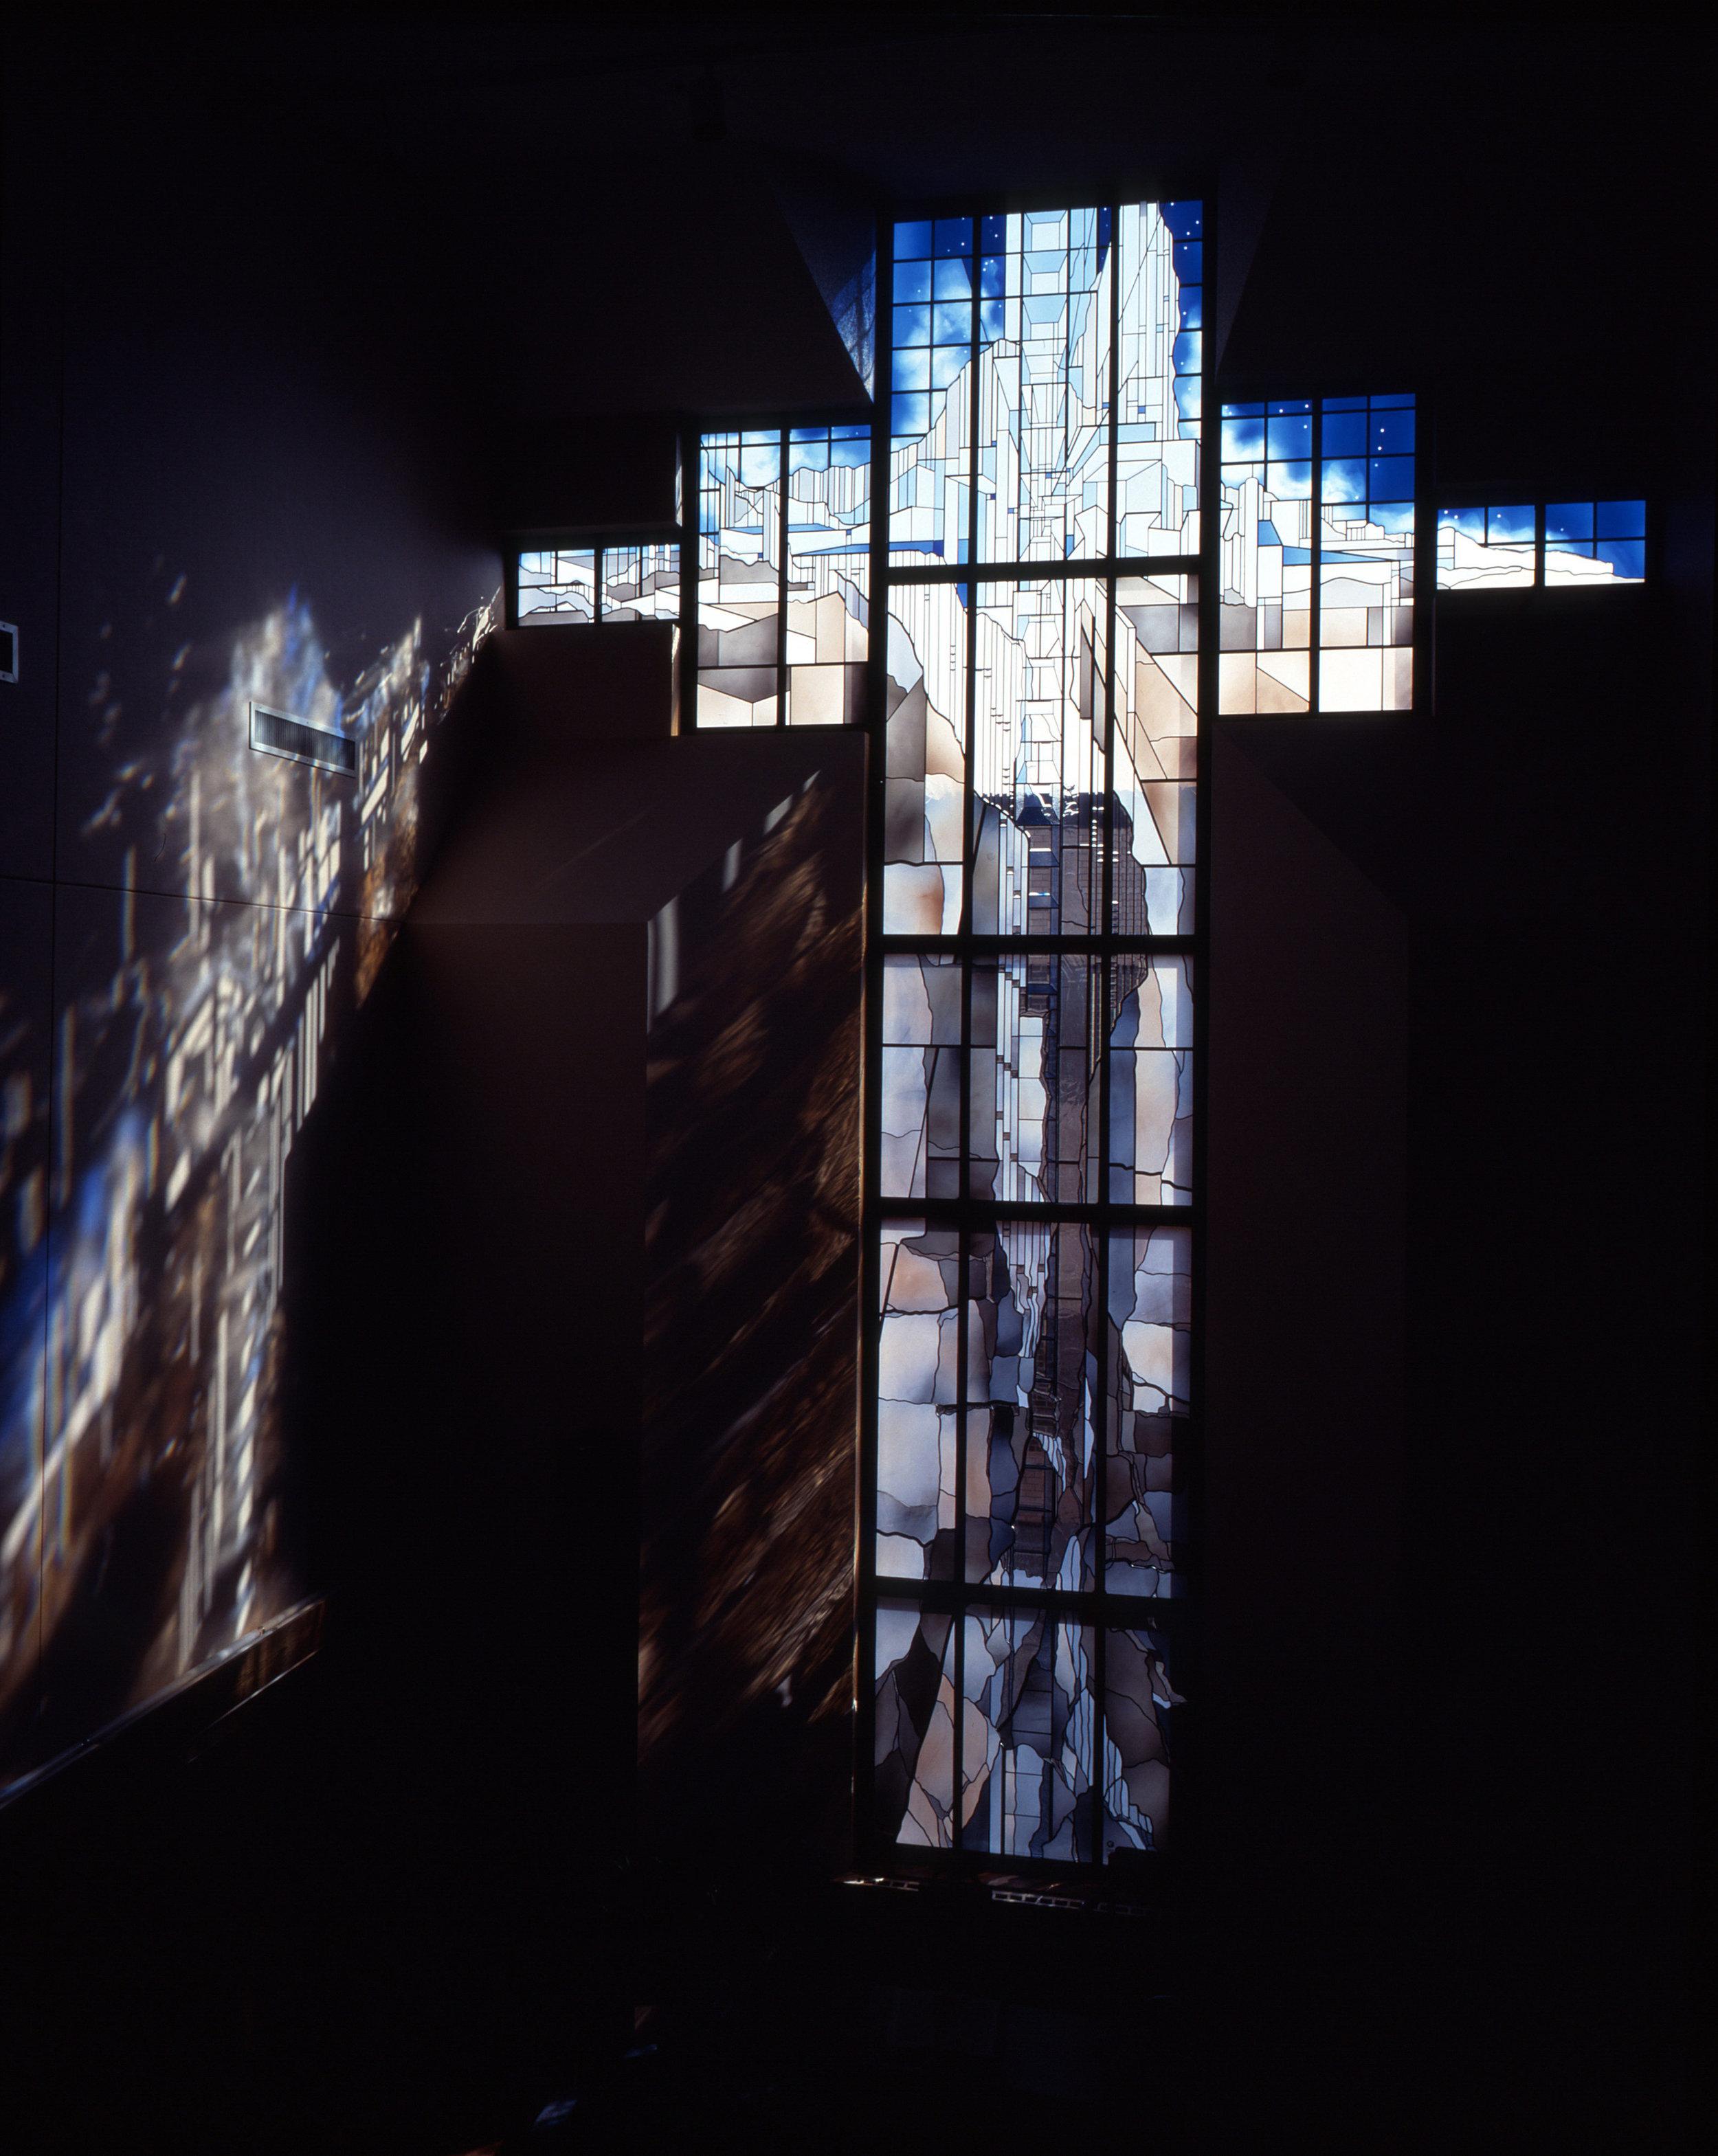 pegasus-studio-inc-stained-glass-chapel-1.jpg